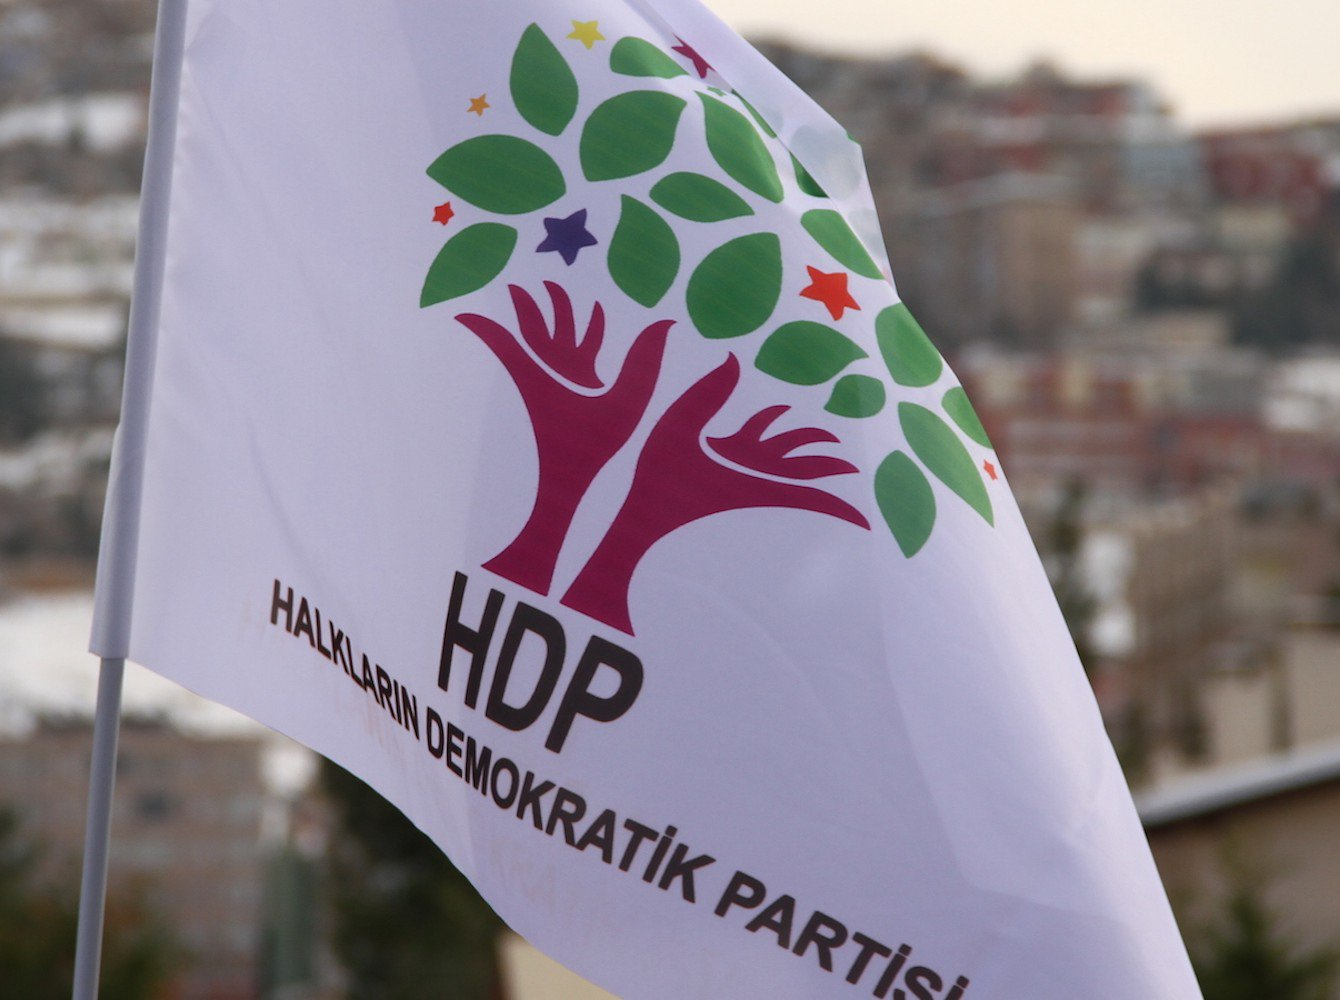 At forsvare HDP er at forsvare demokrati